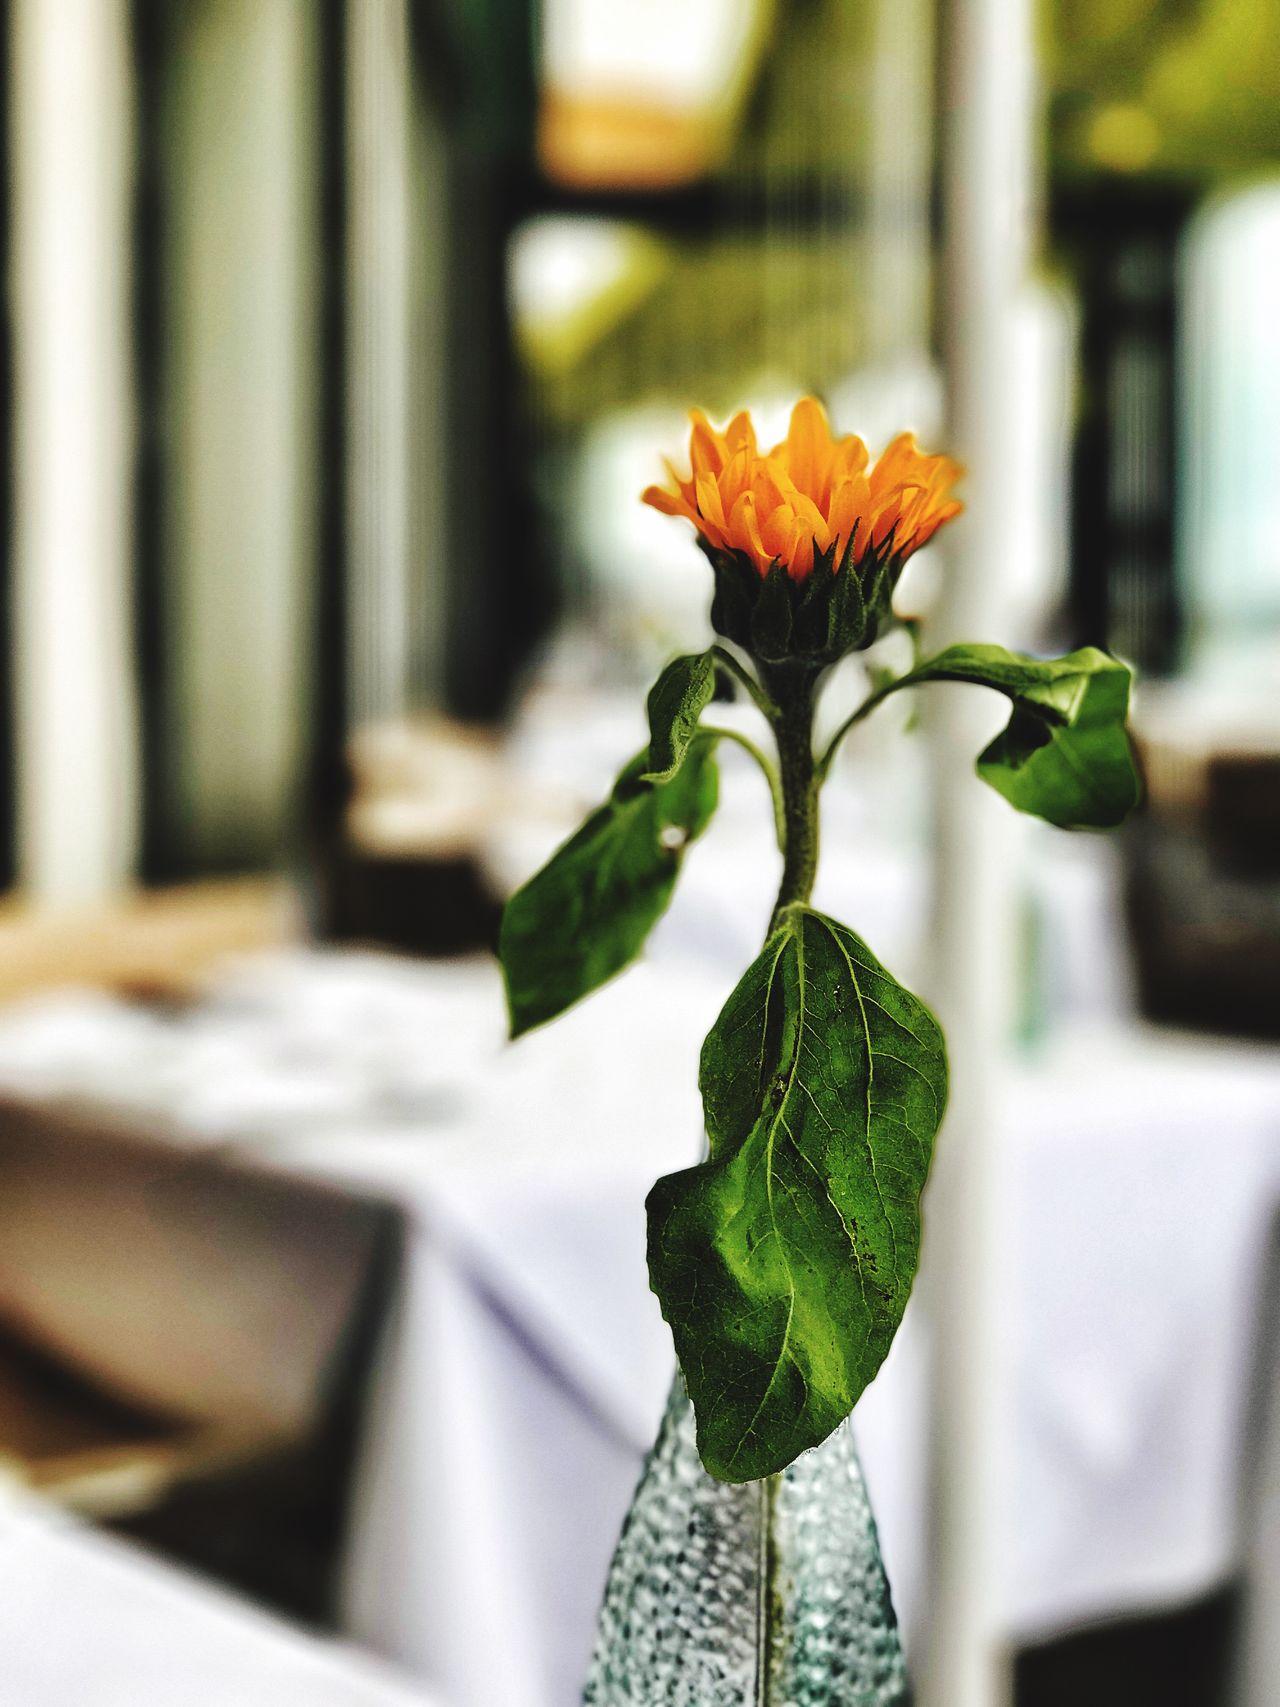 Flower Indoors  Close-up Hotel